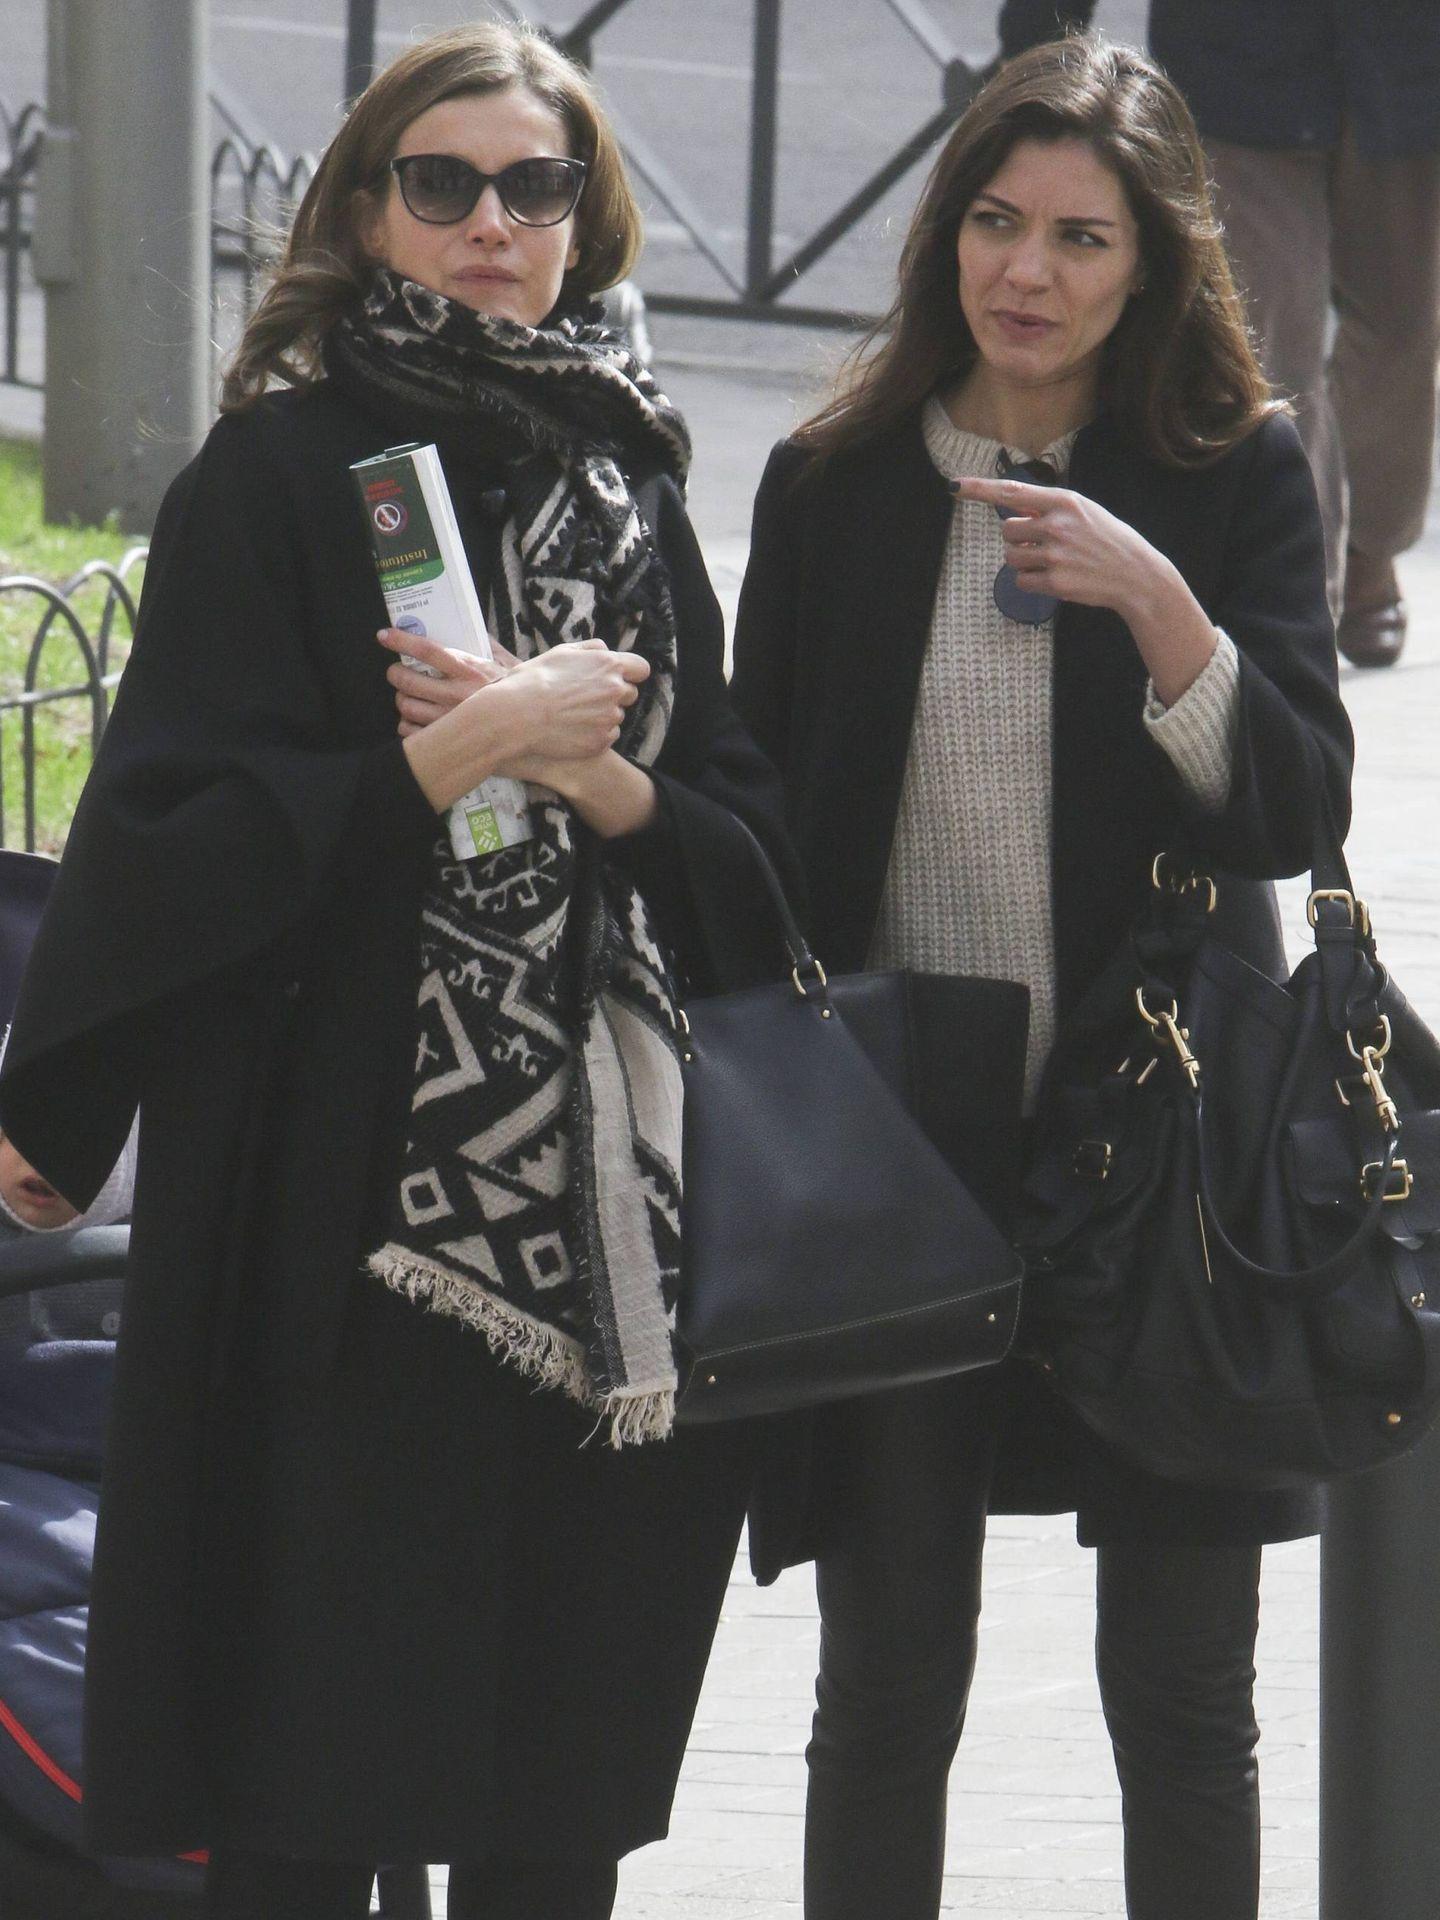 La Reina con la bufanda. (CP)